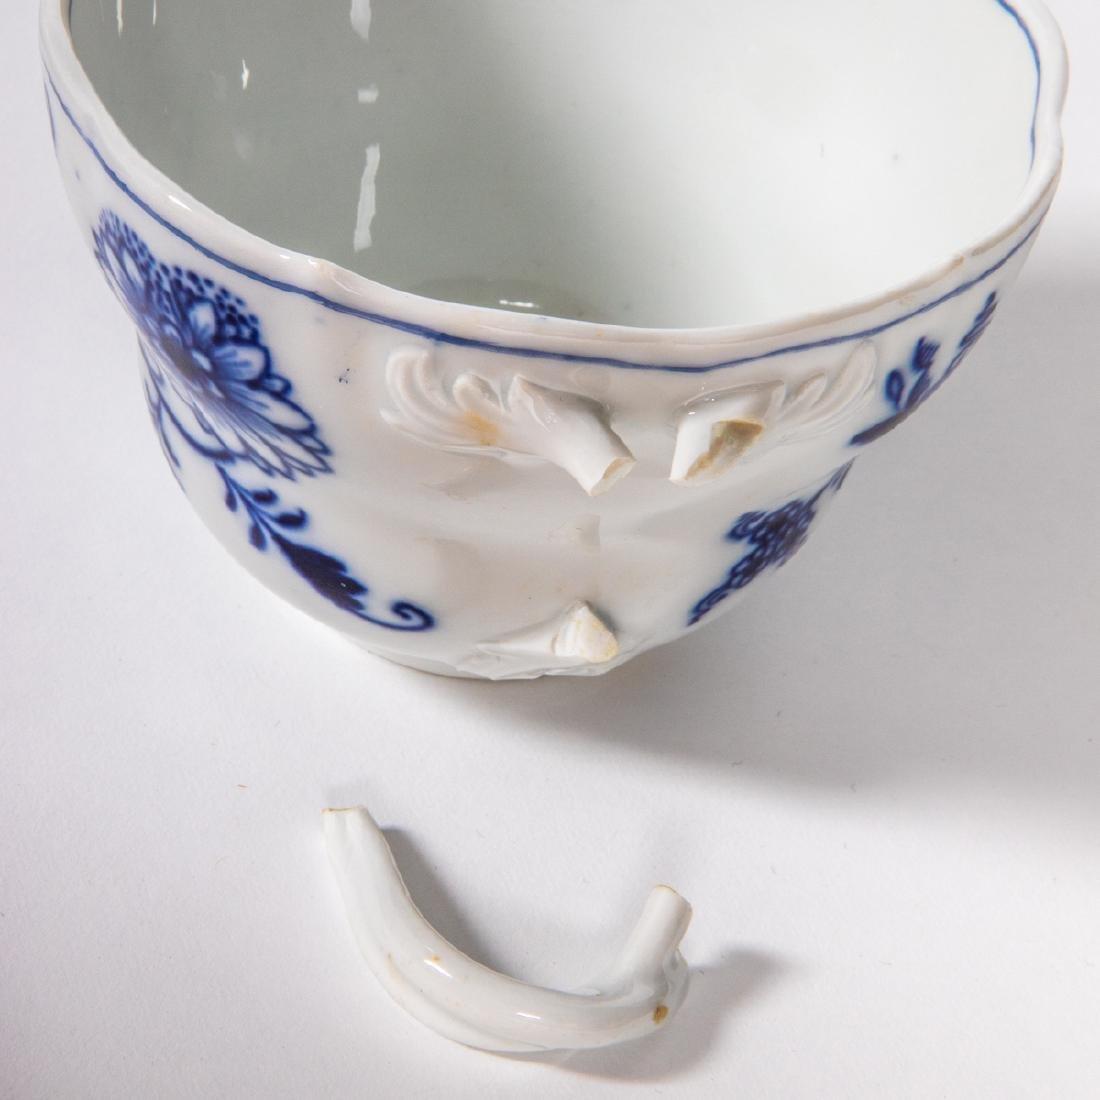 A Meissen Porcelain Dinner Service in the Blue Onion - 7